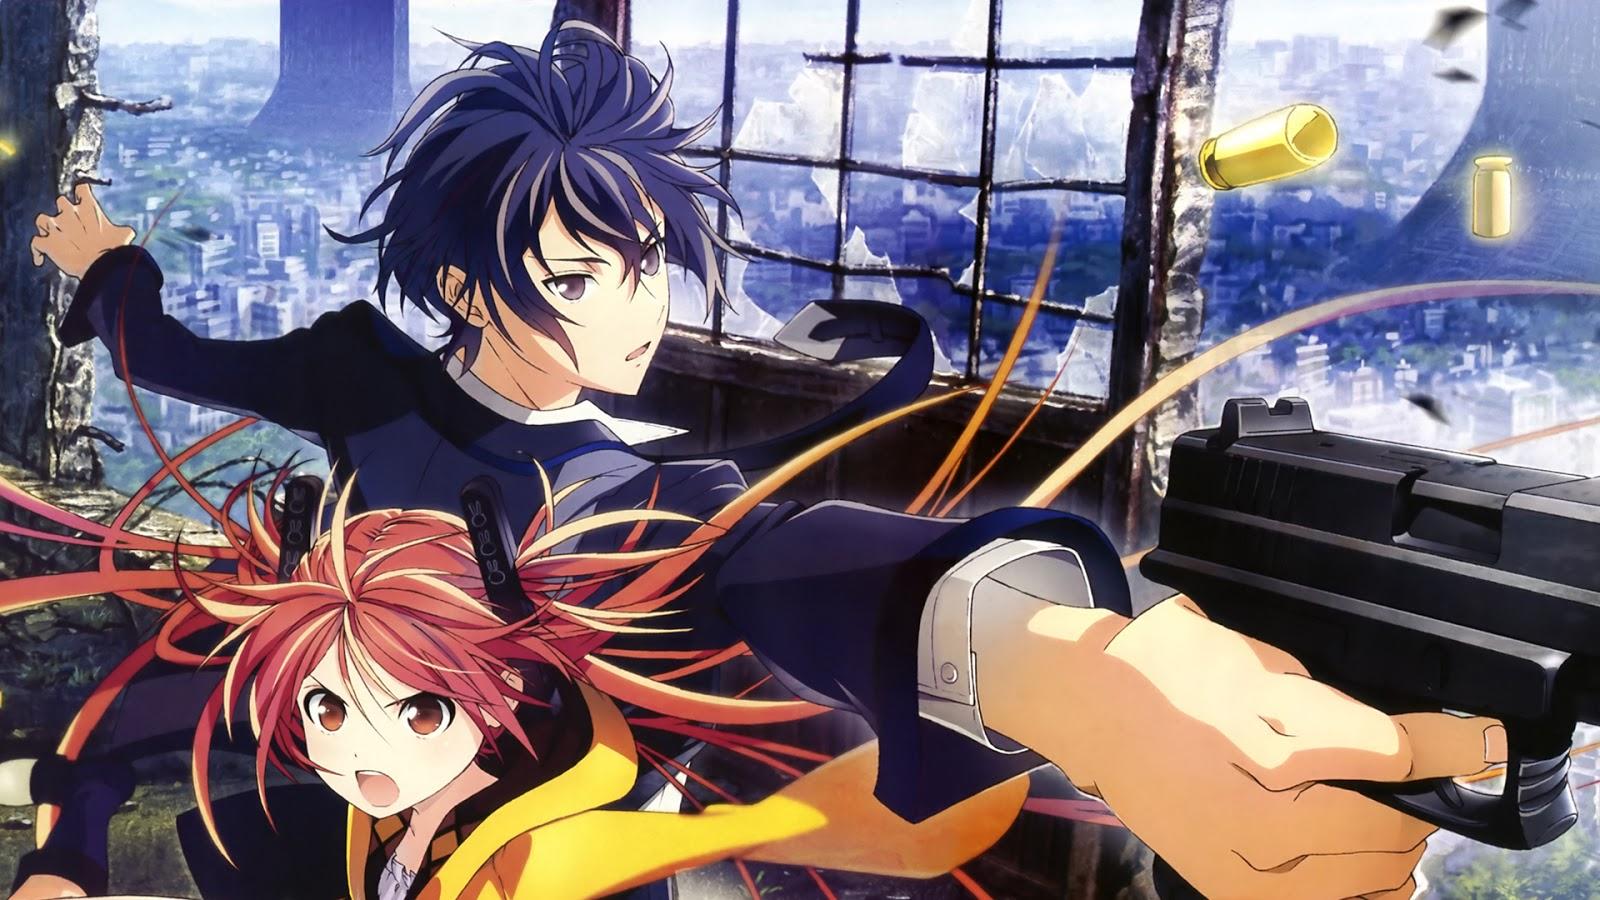 Black Bullet ( Anime ) Black-bullet-anime-enju-aihara-rentarou-satomi-hd-1920x1080